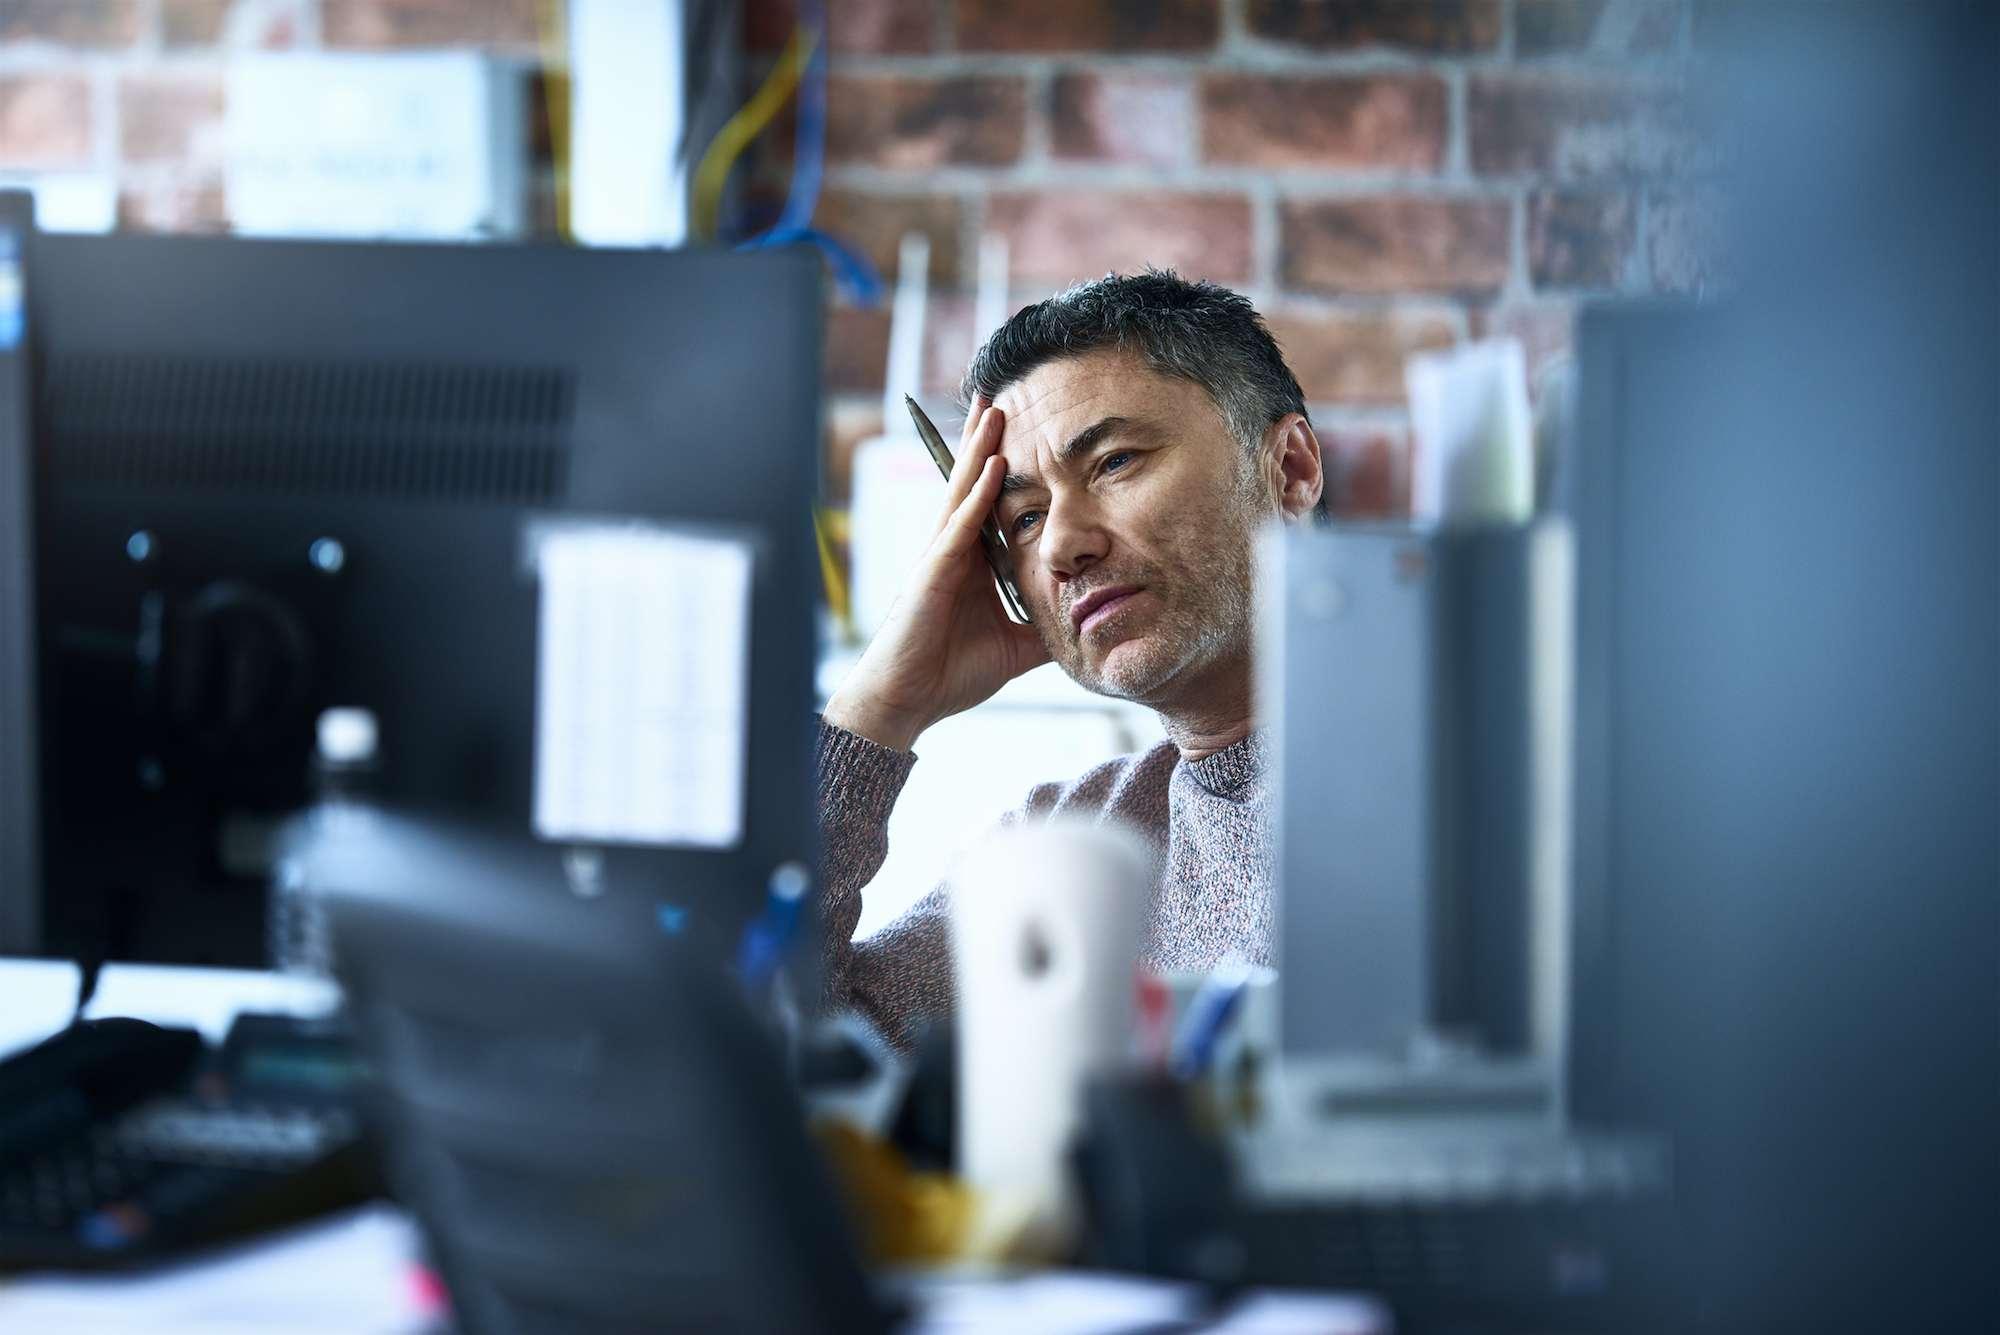 Man tired at work